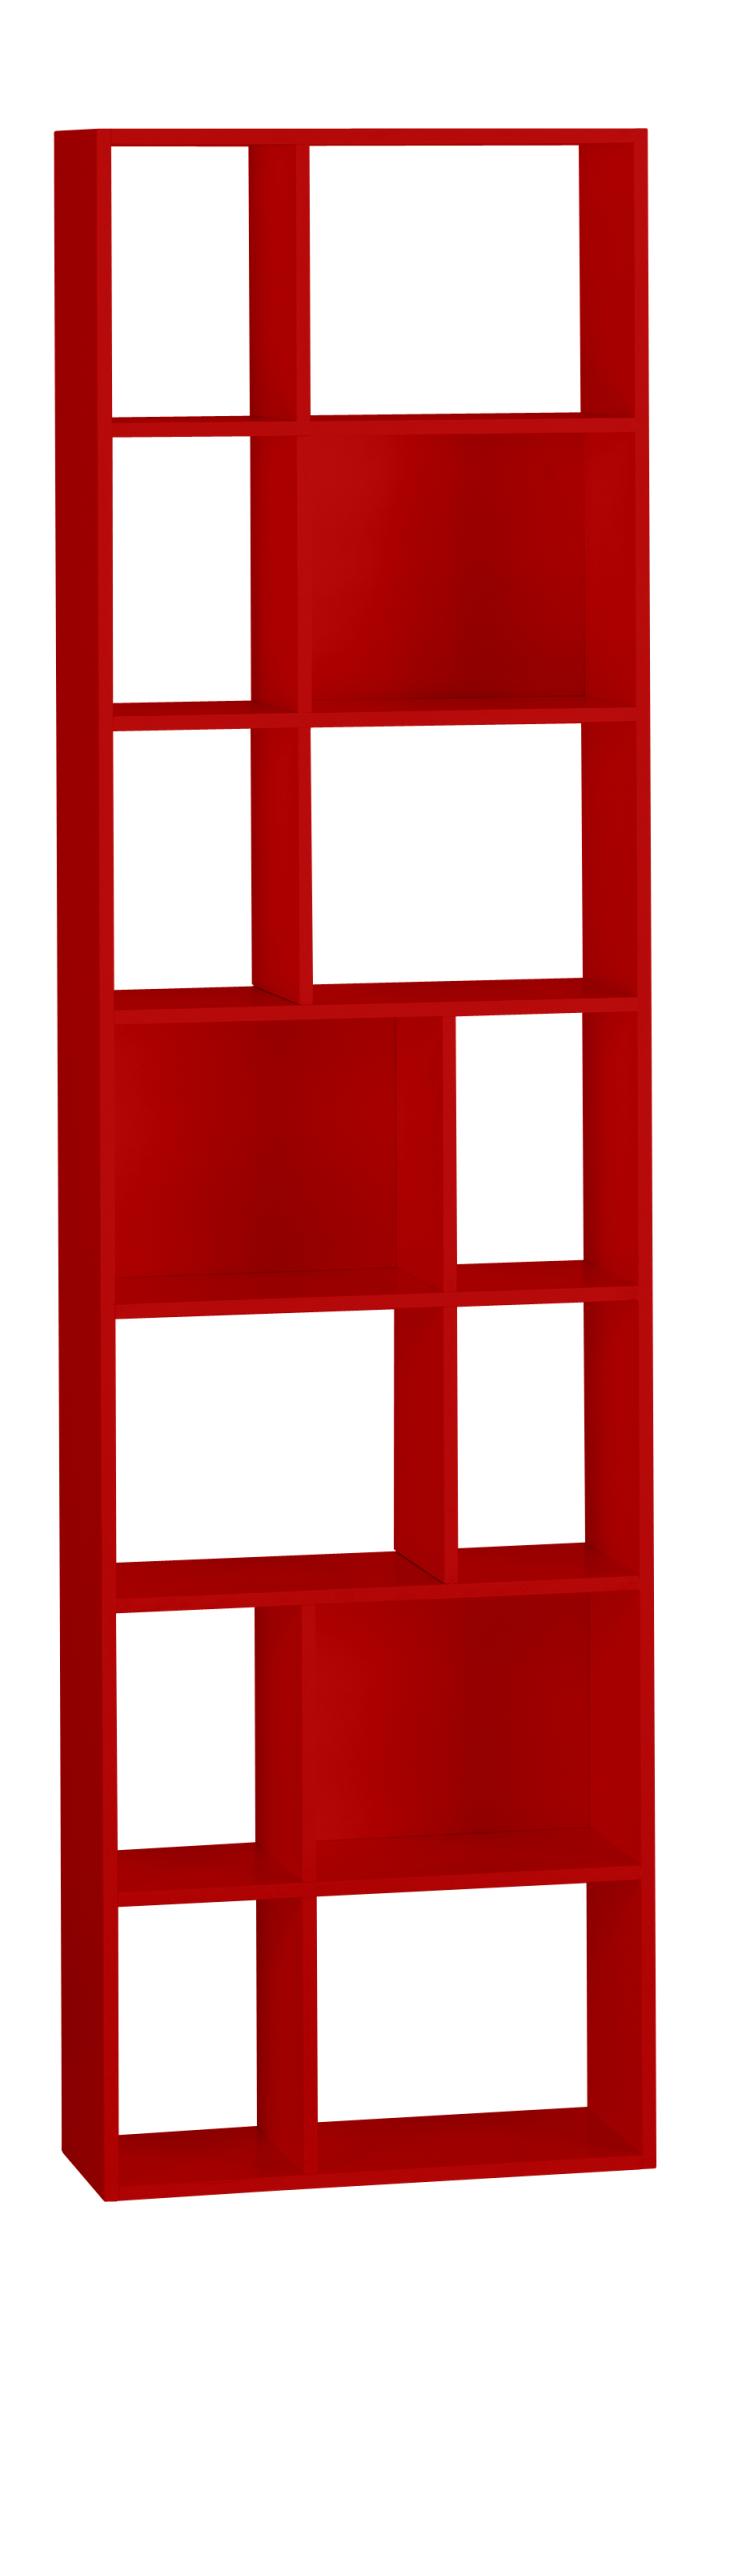 cleo tag res et biblioth ques rouge bois m tal rouge et. Black Bedroom Furniture Sets. Home Design Ideas